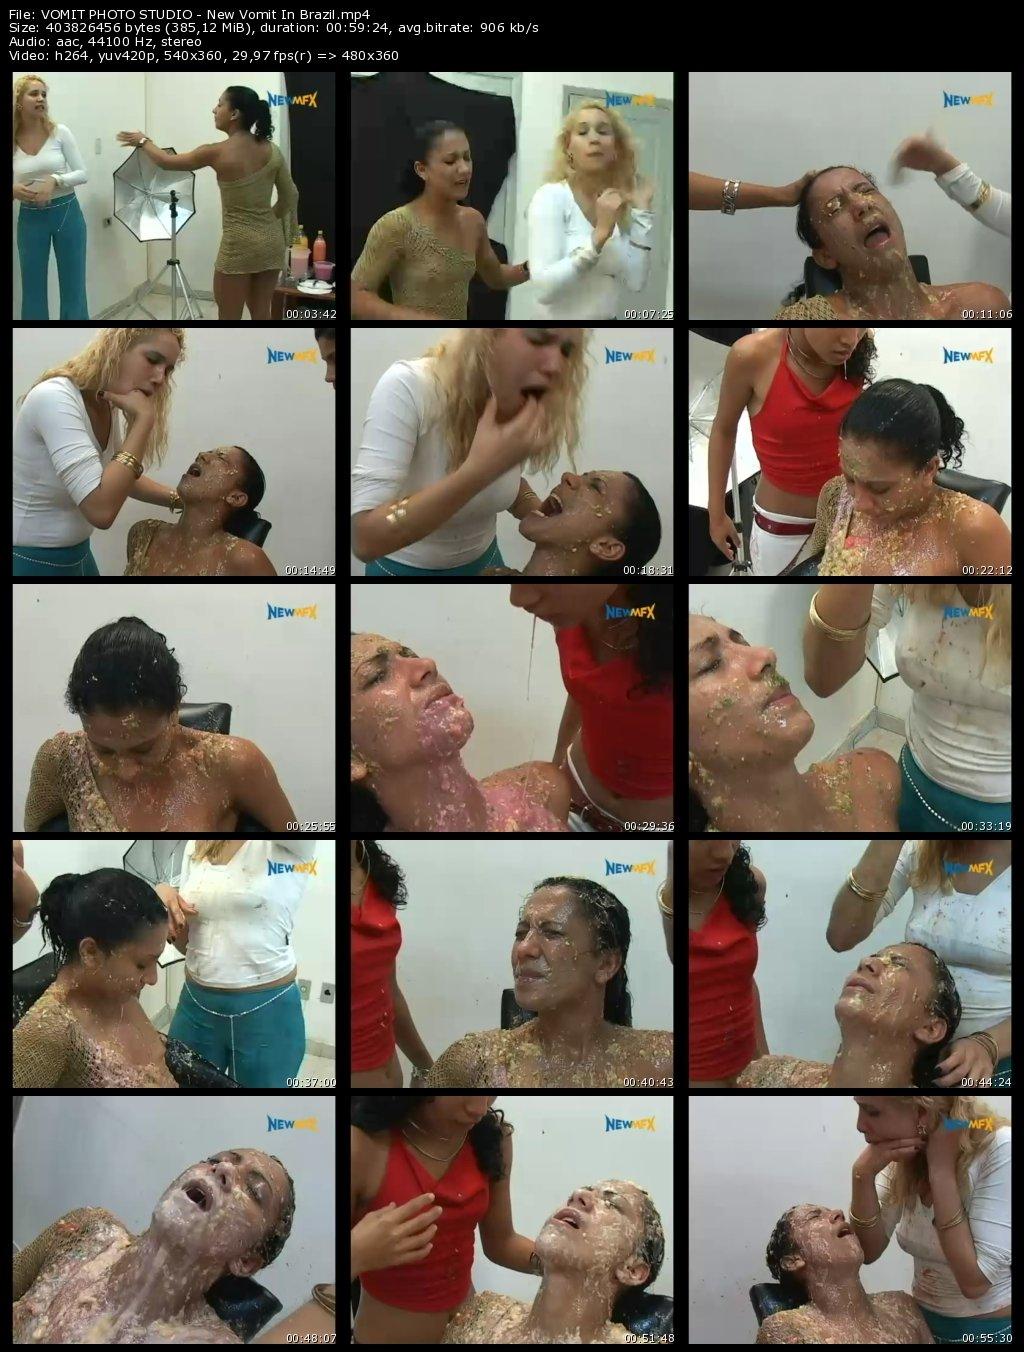 VOMIT PHOTO STUDIO - Giovanna, Michelle and Priscila from New Vomit In Brazil